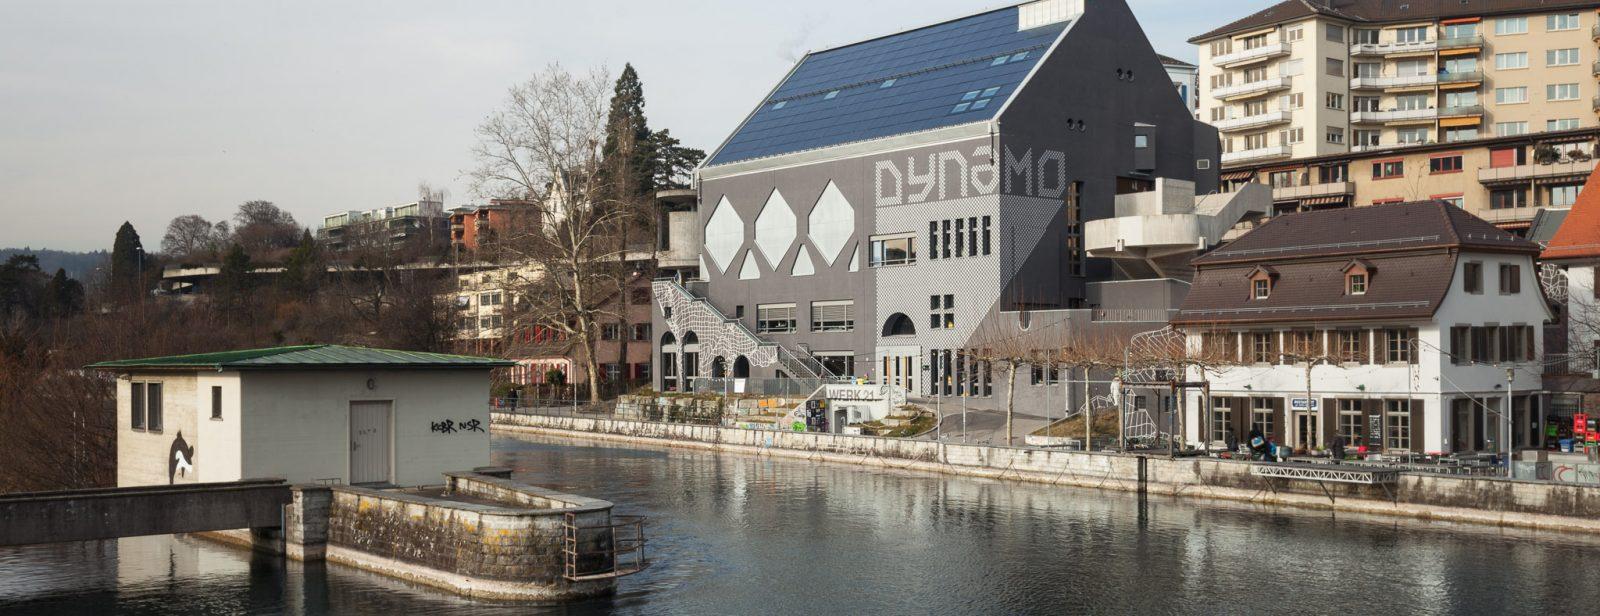 Umbau Jugendkulturhaus Dynamo, Zürich